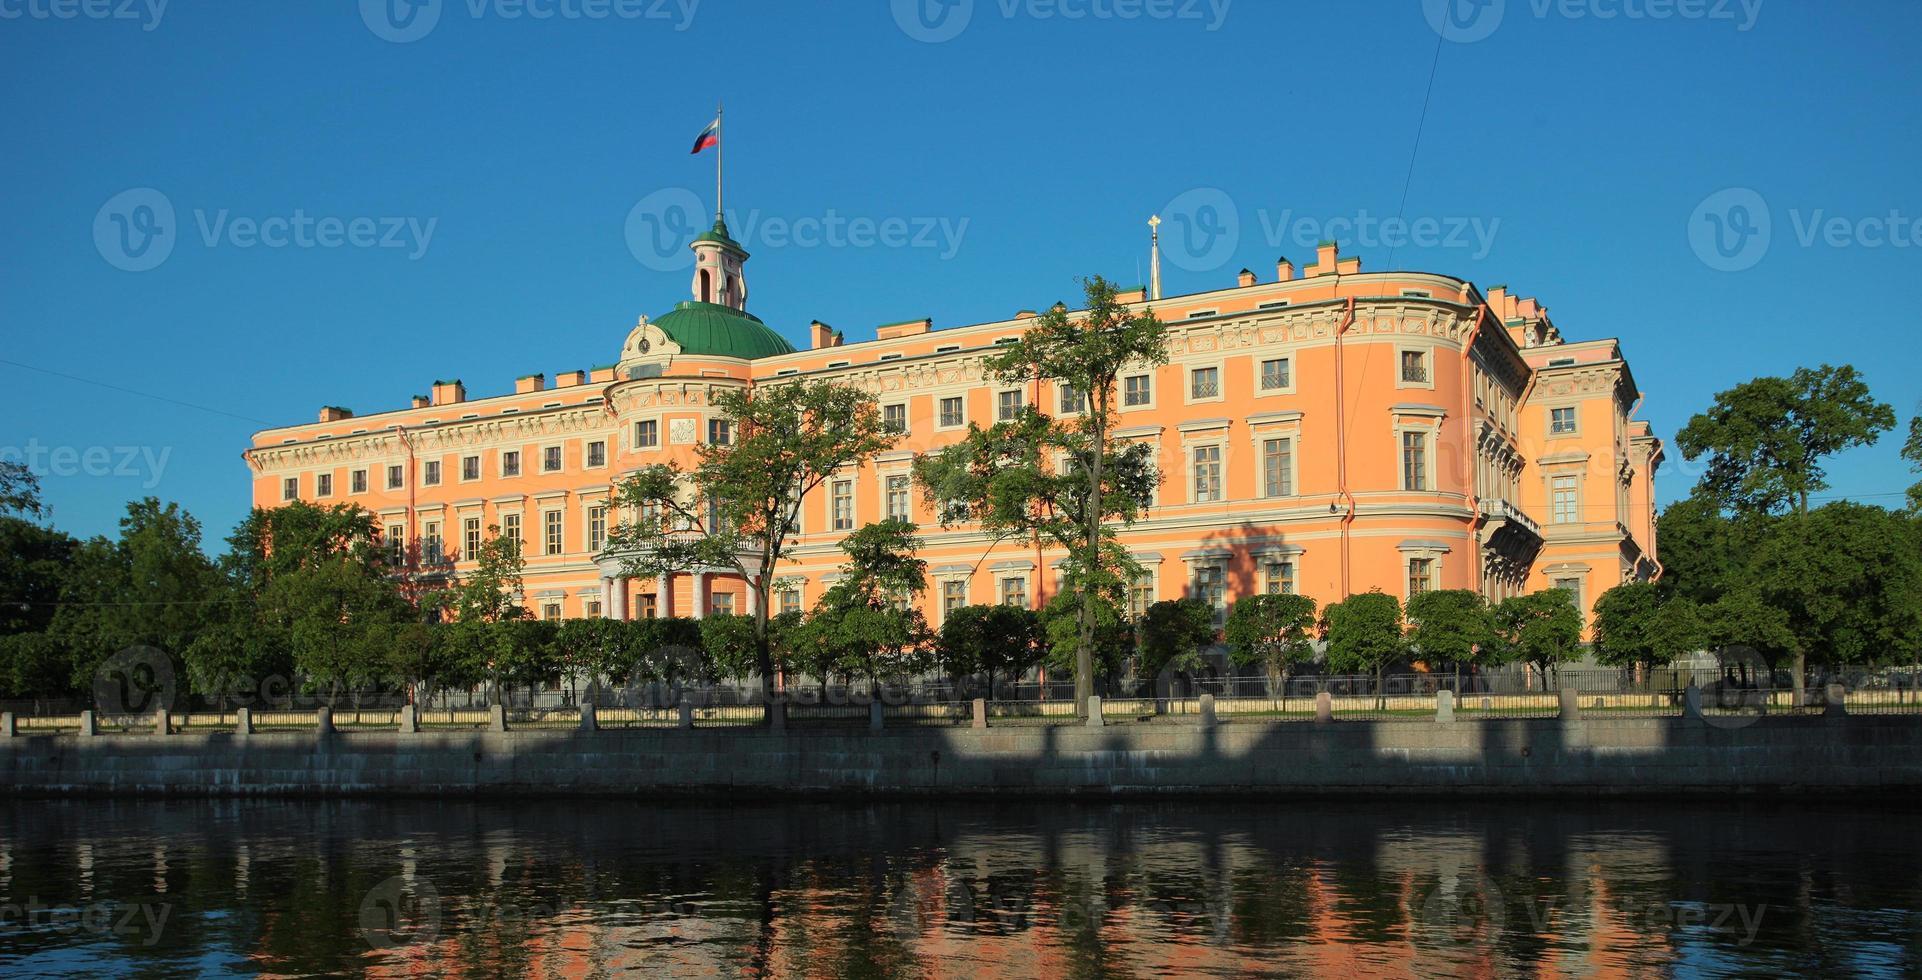 castello dell'ingegnere. San Pietroburgo, Russia foto